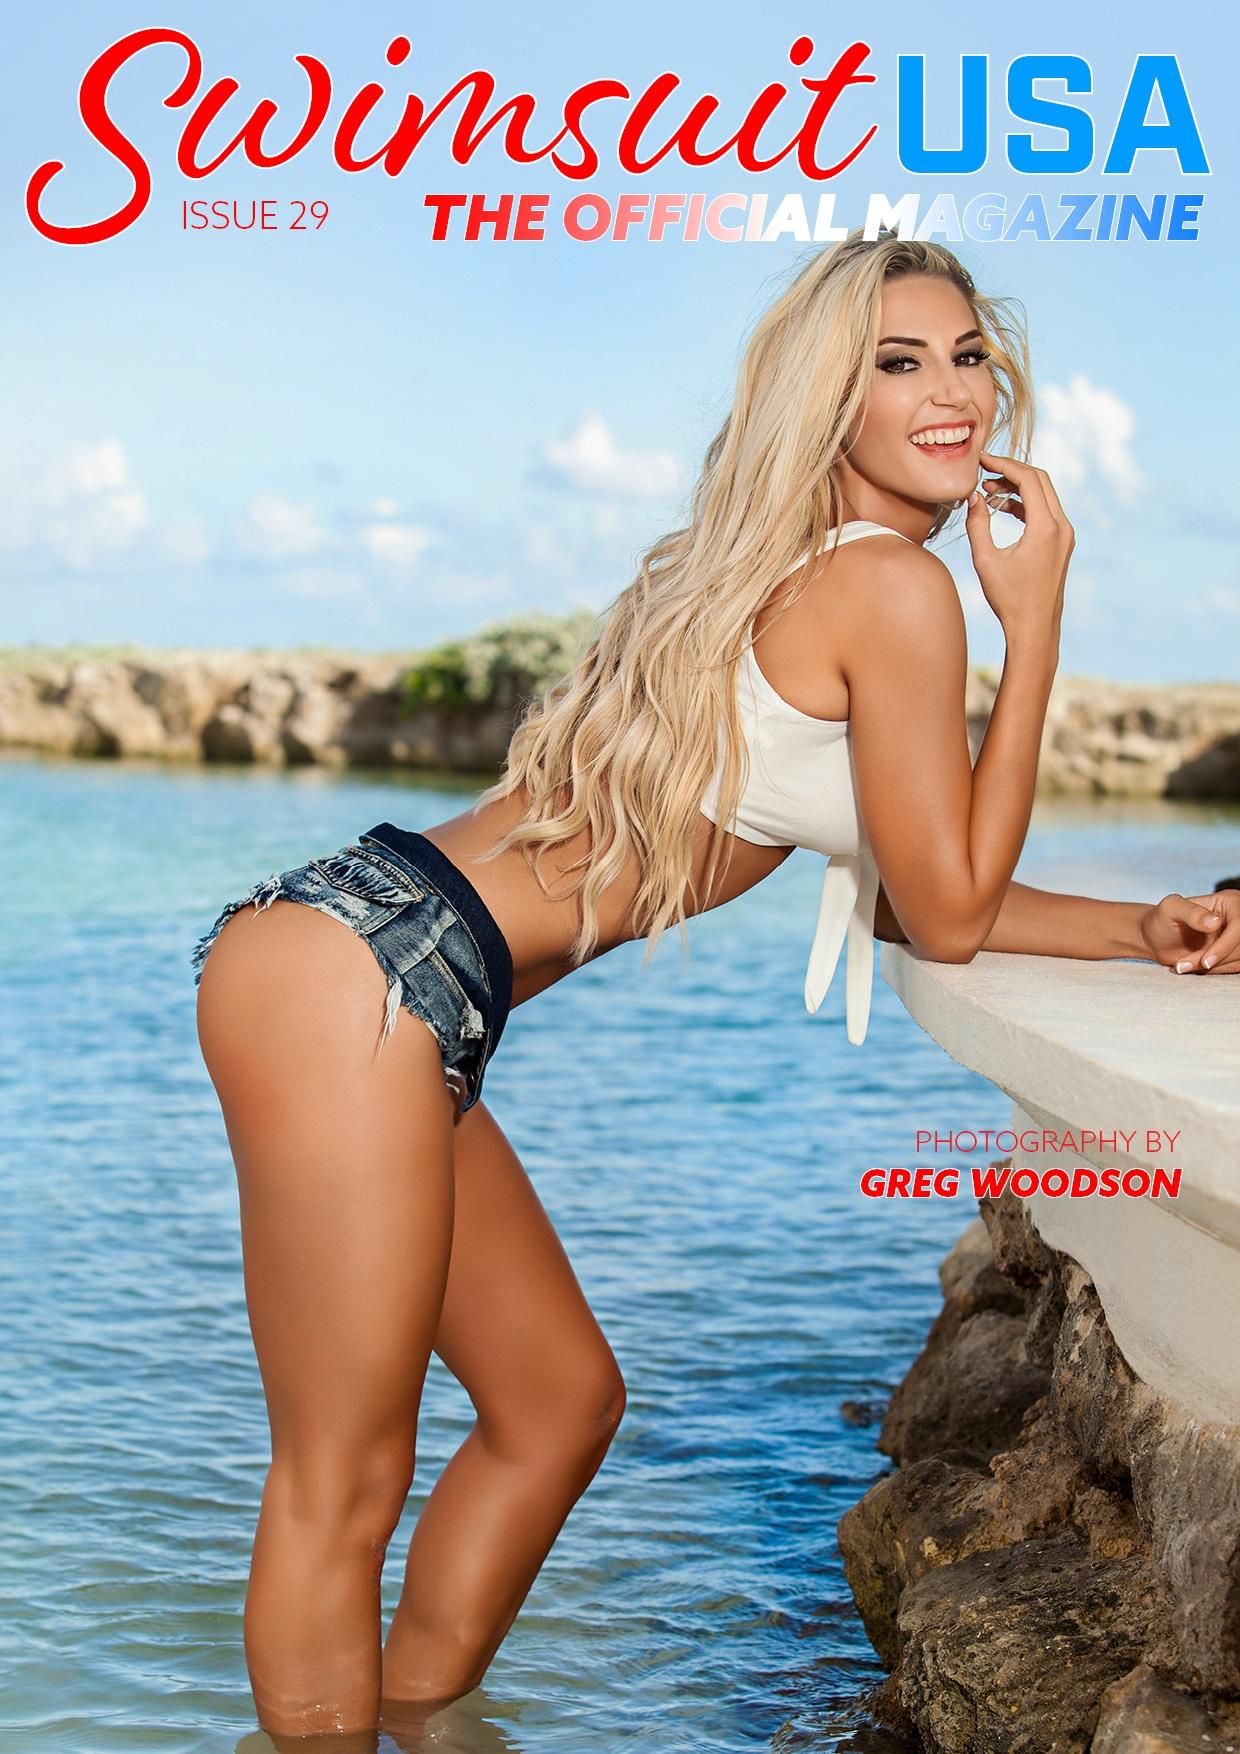 Swimsuit USA Magazine - Issue 29 - Lara Mitton